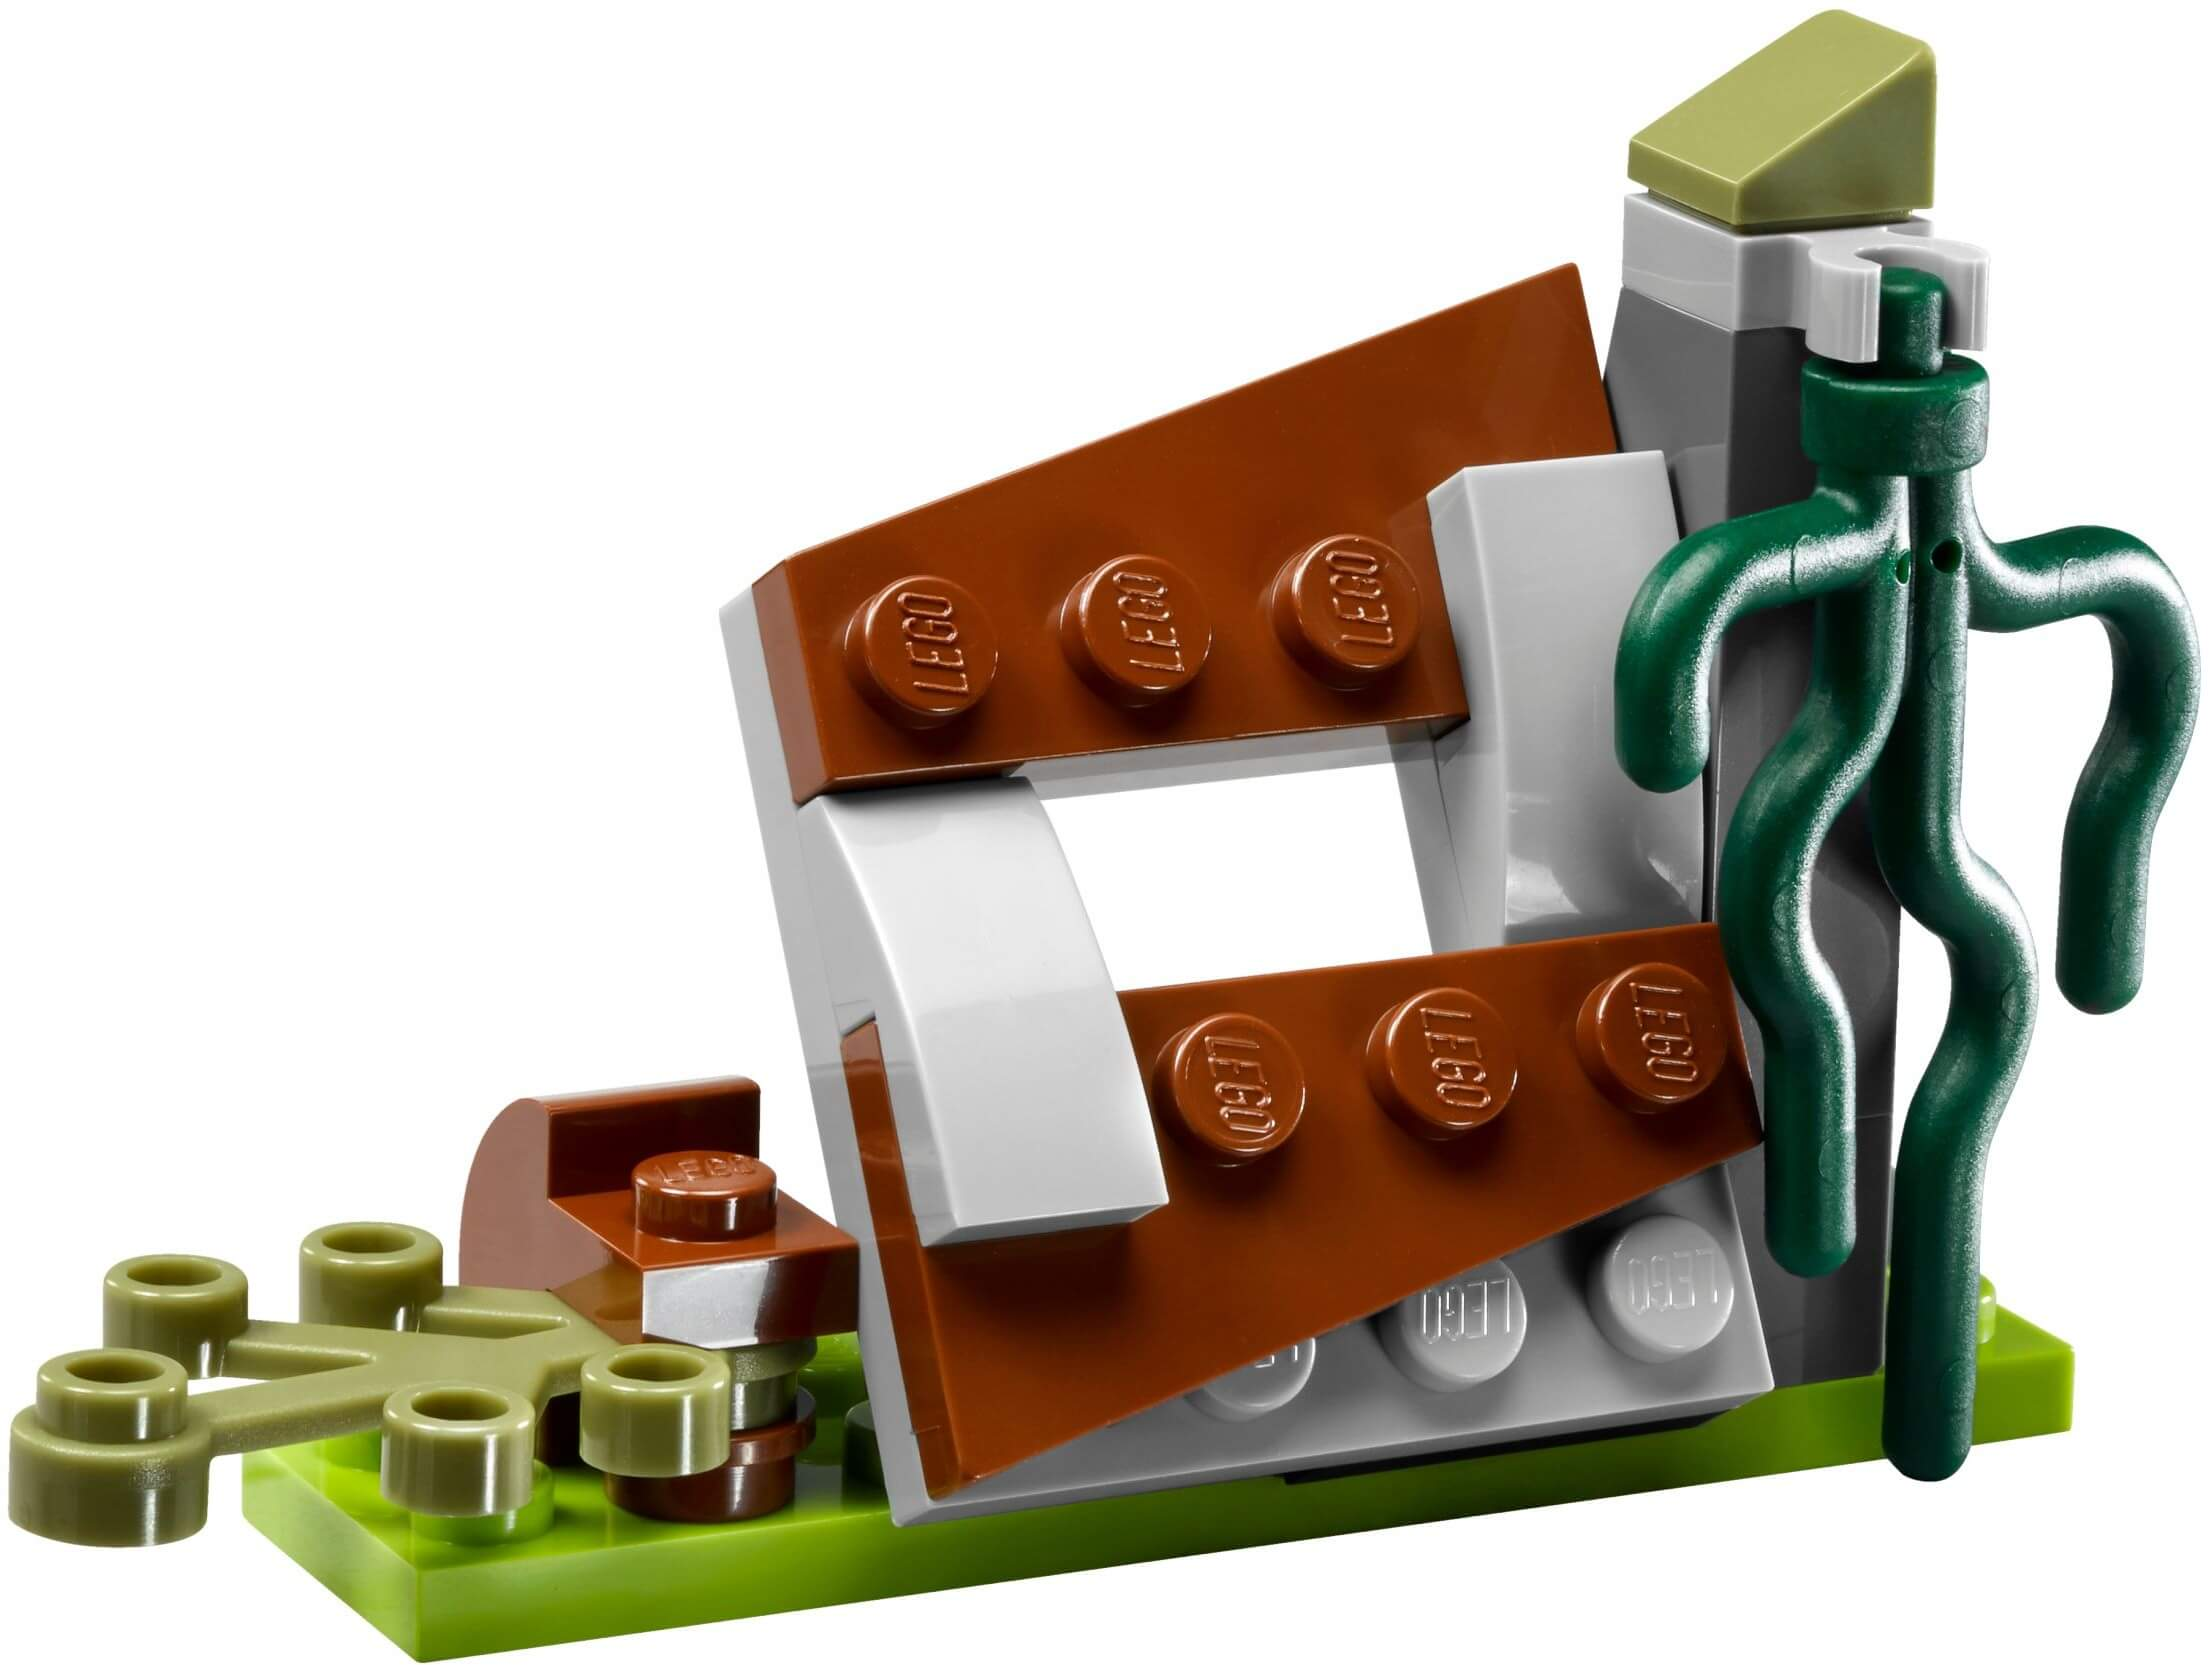 Mua đồ chơi LEGO 70624 - LEGO Ninjago 70624 - Cỗ Xe Tàn Phá của bọn Vermillion (LEGO 70624 Vermillion Invader)